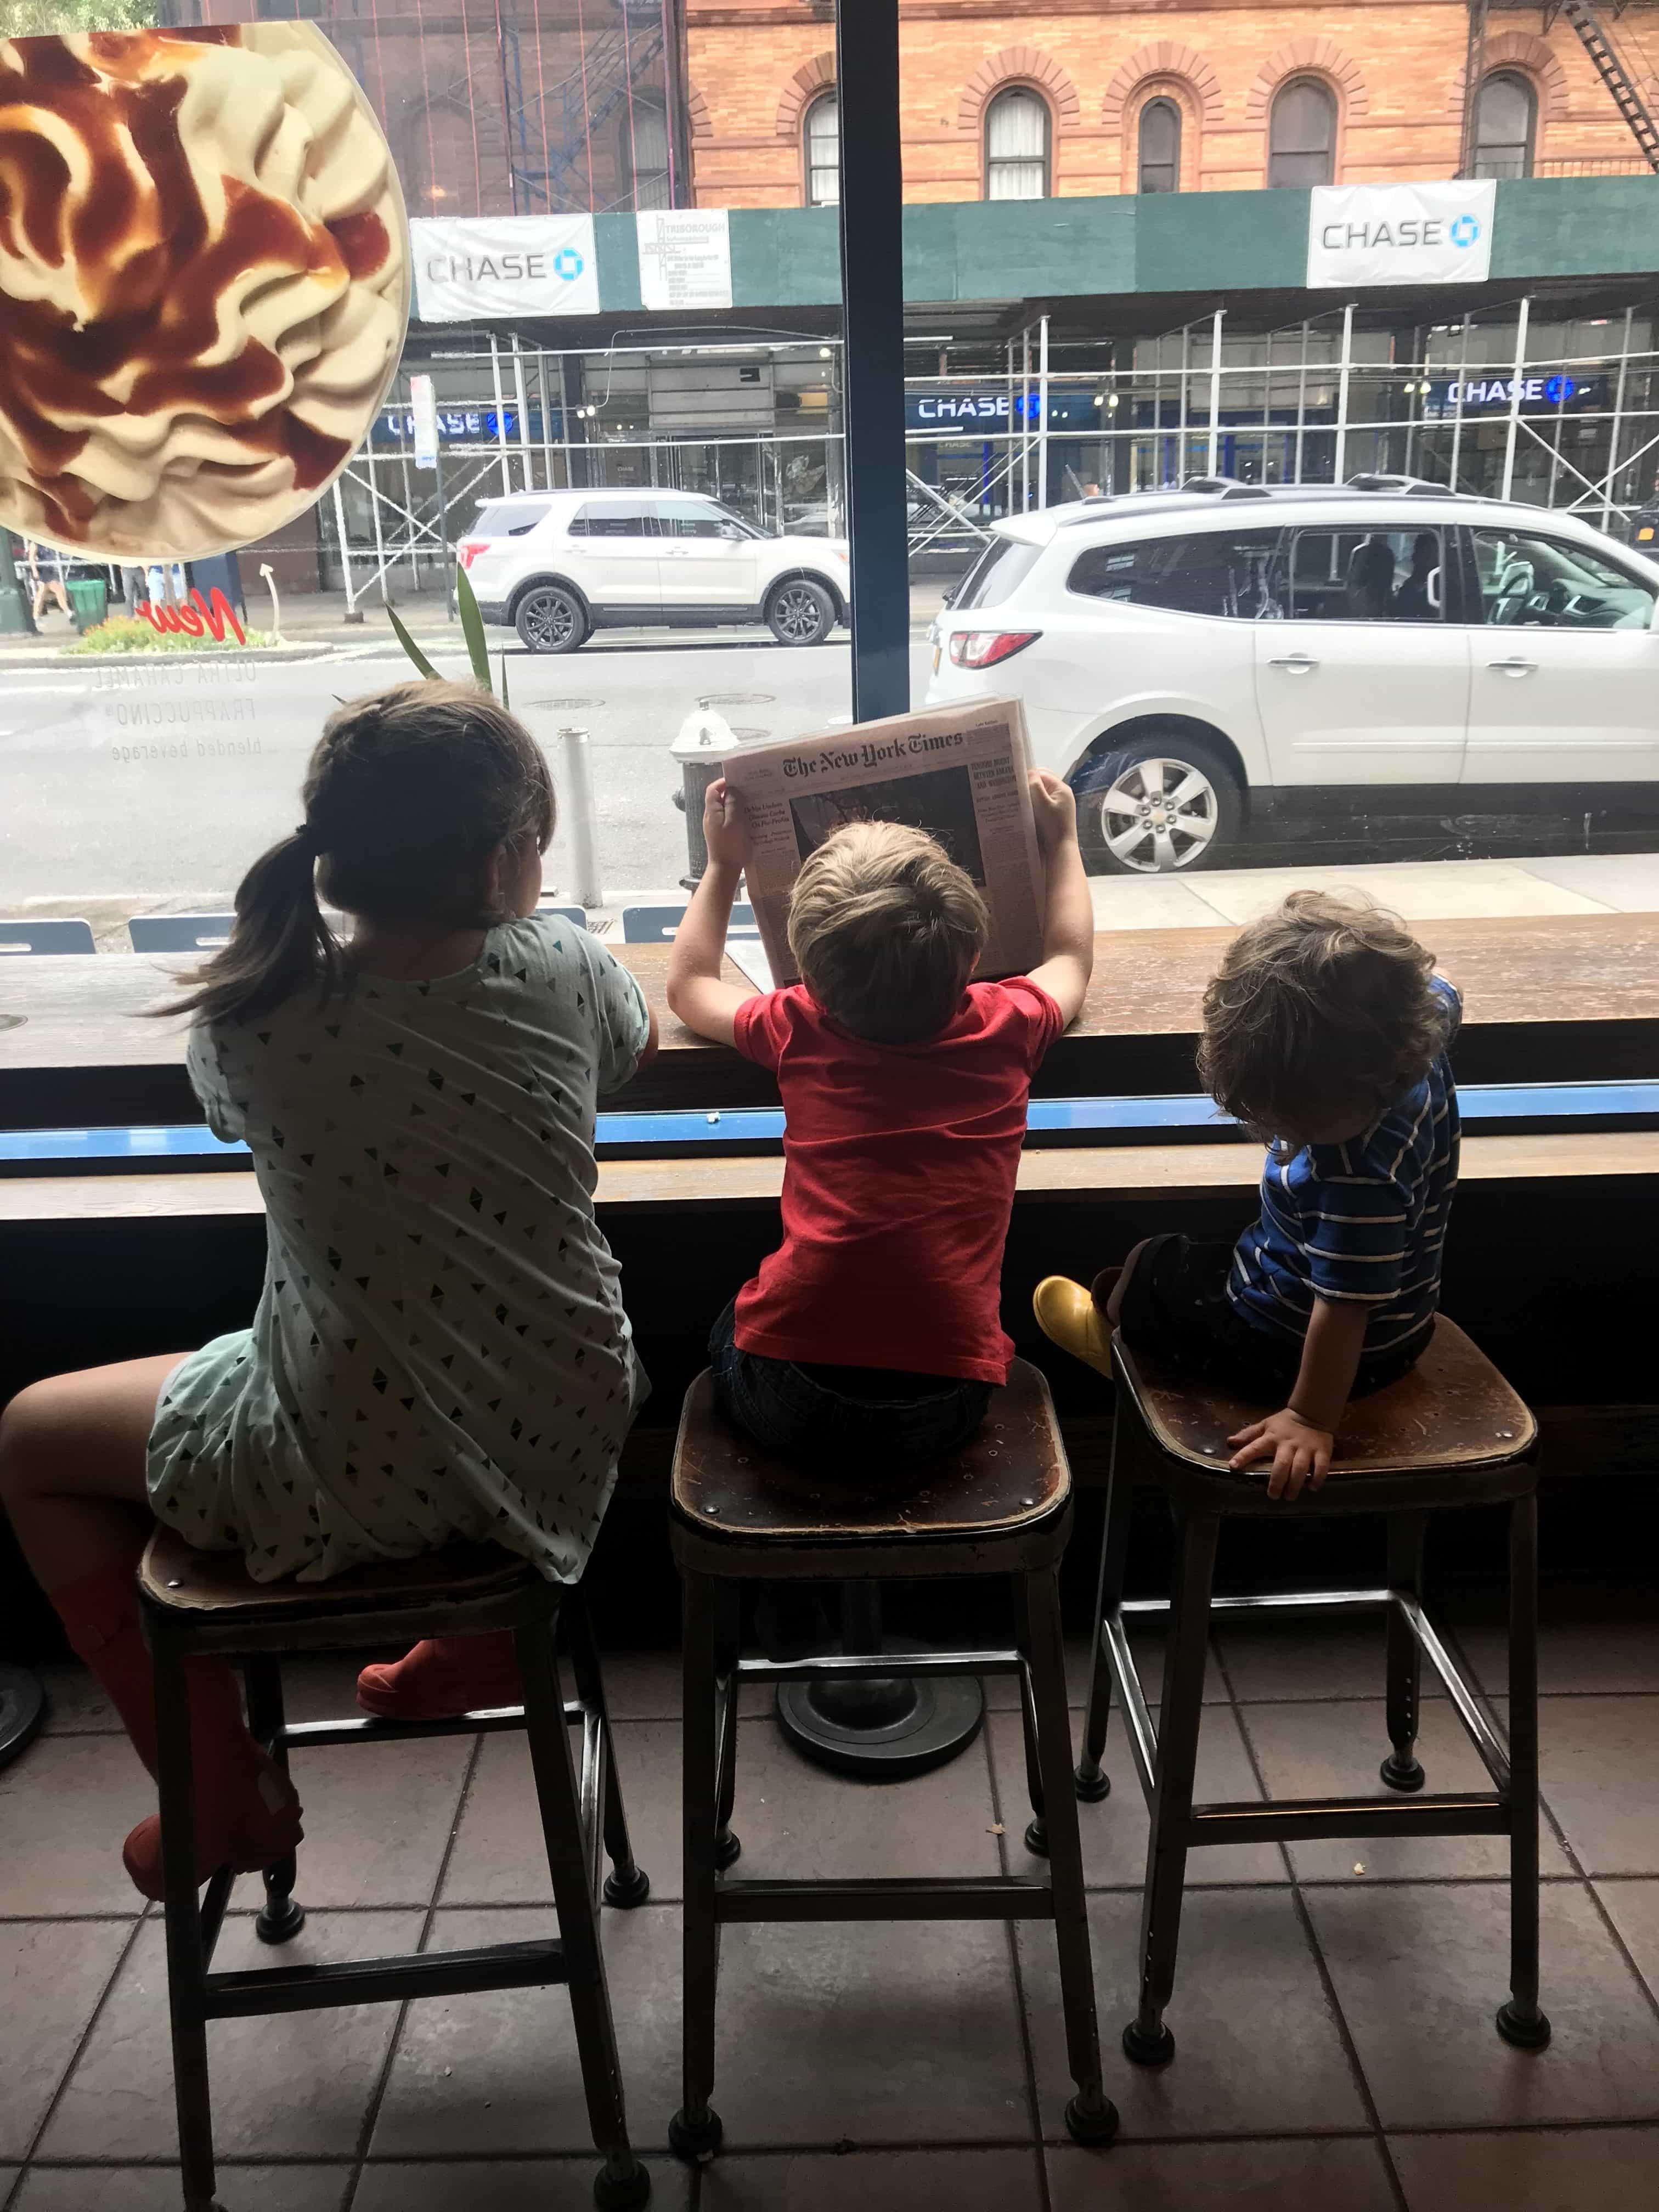 Kids sitting at a bar